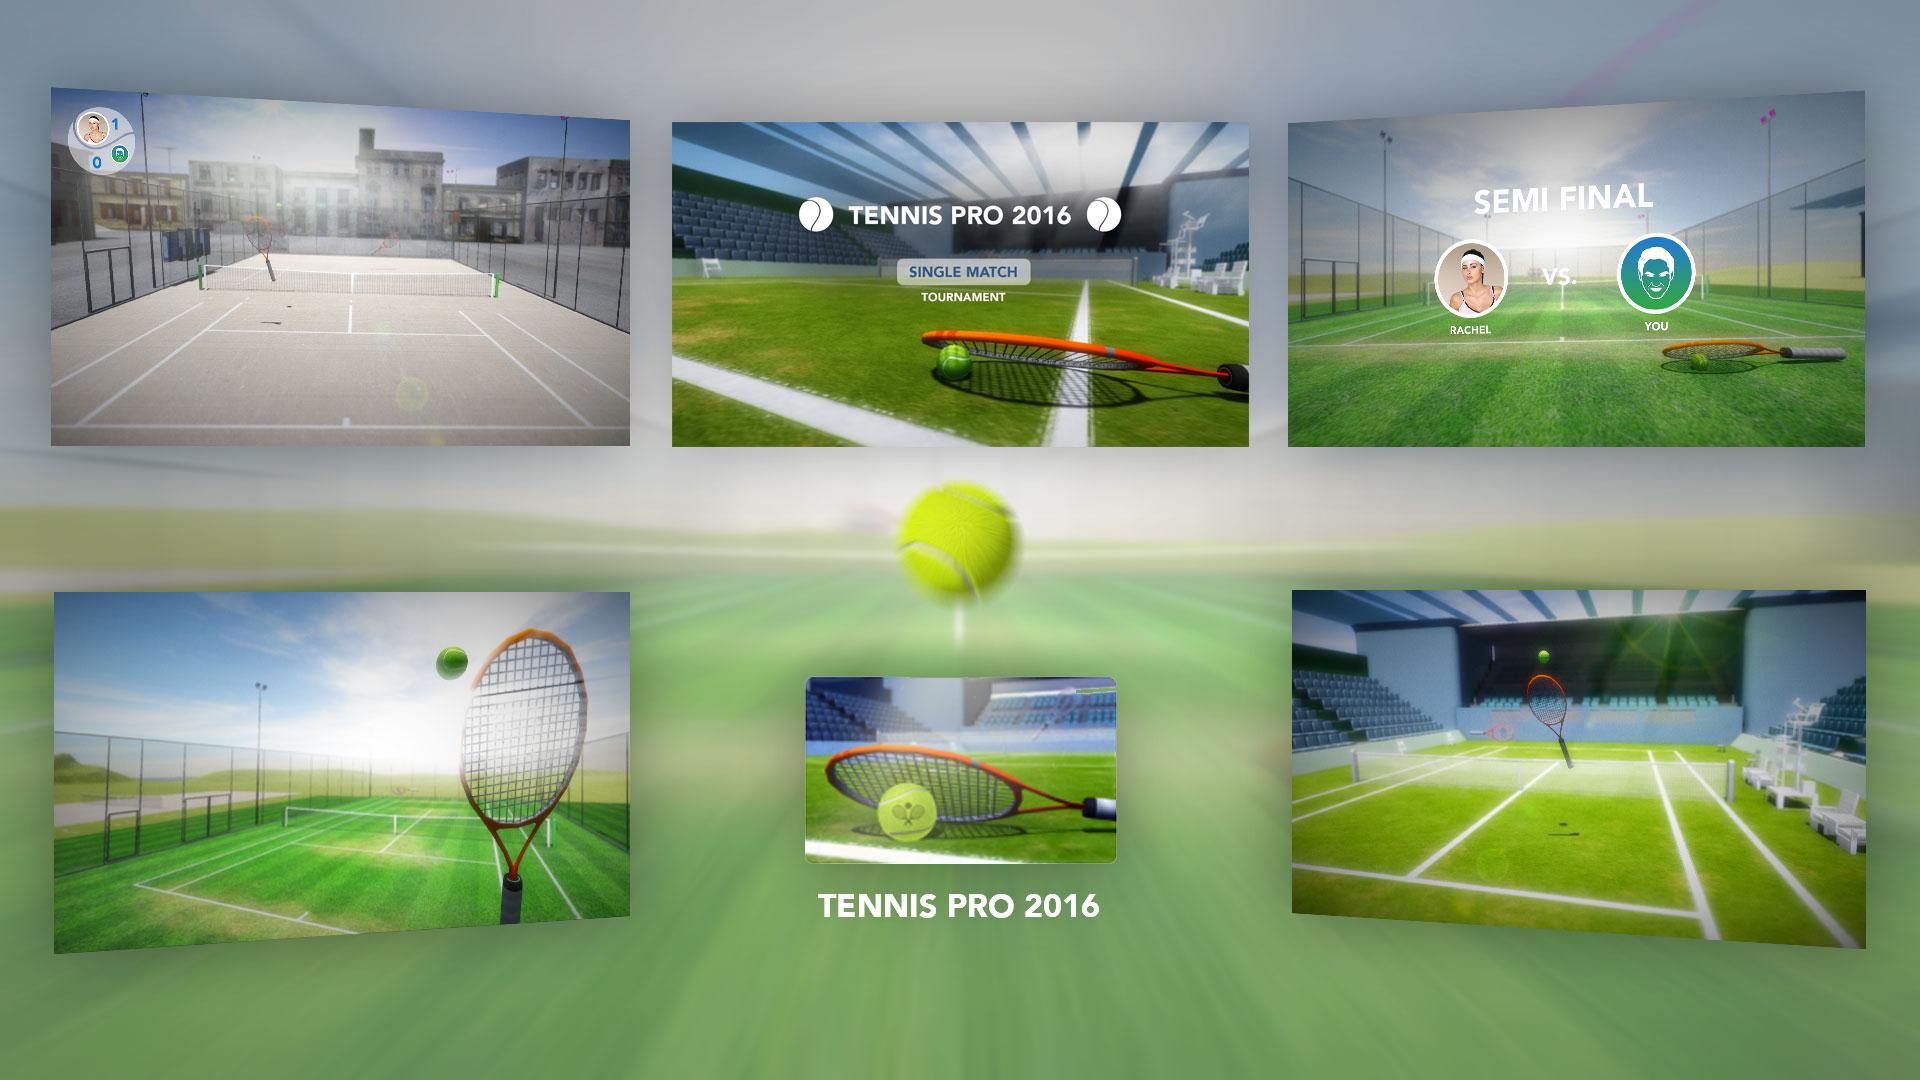 Sports Pro - Golf Tennis Bowling Pool screenshot 3